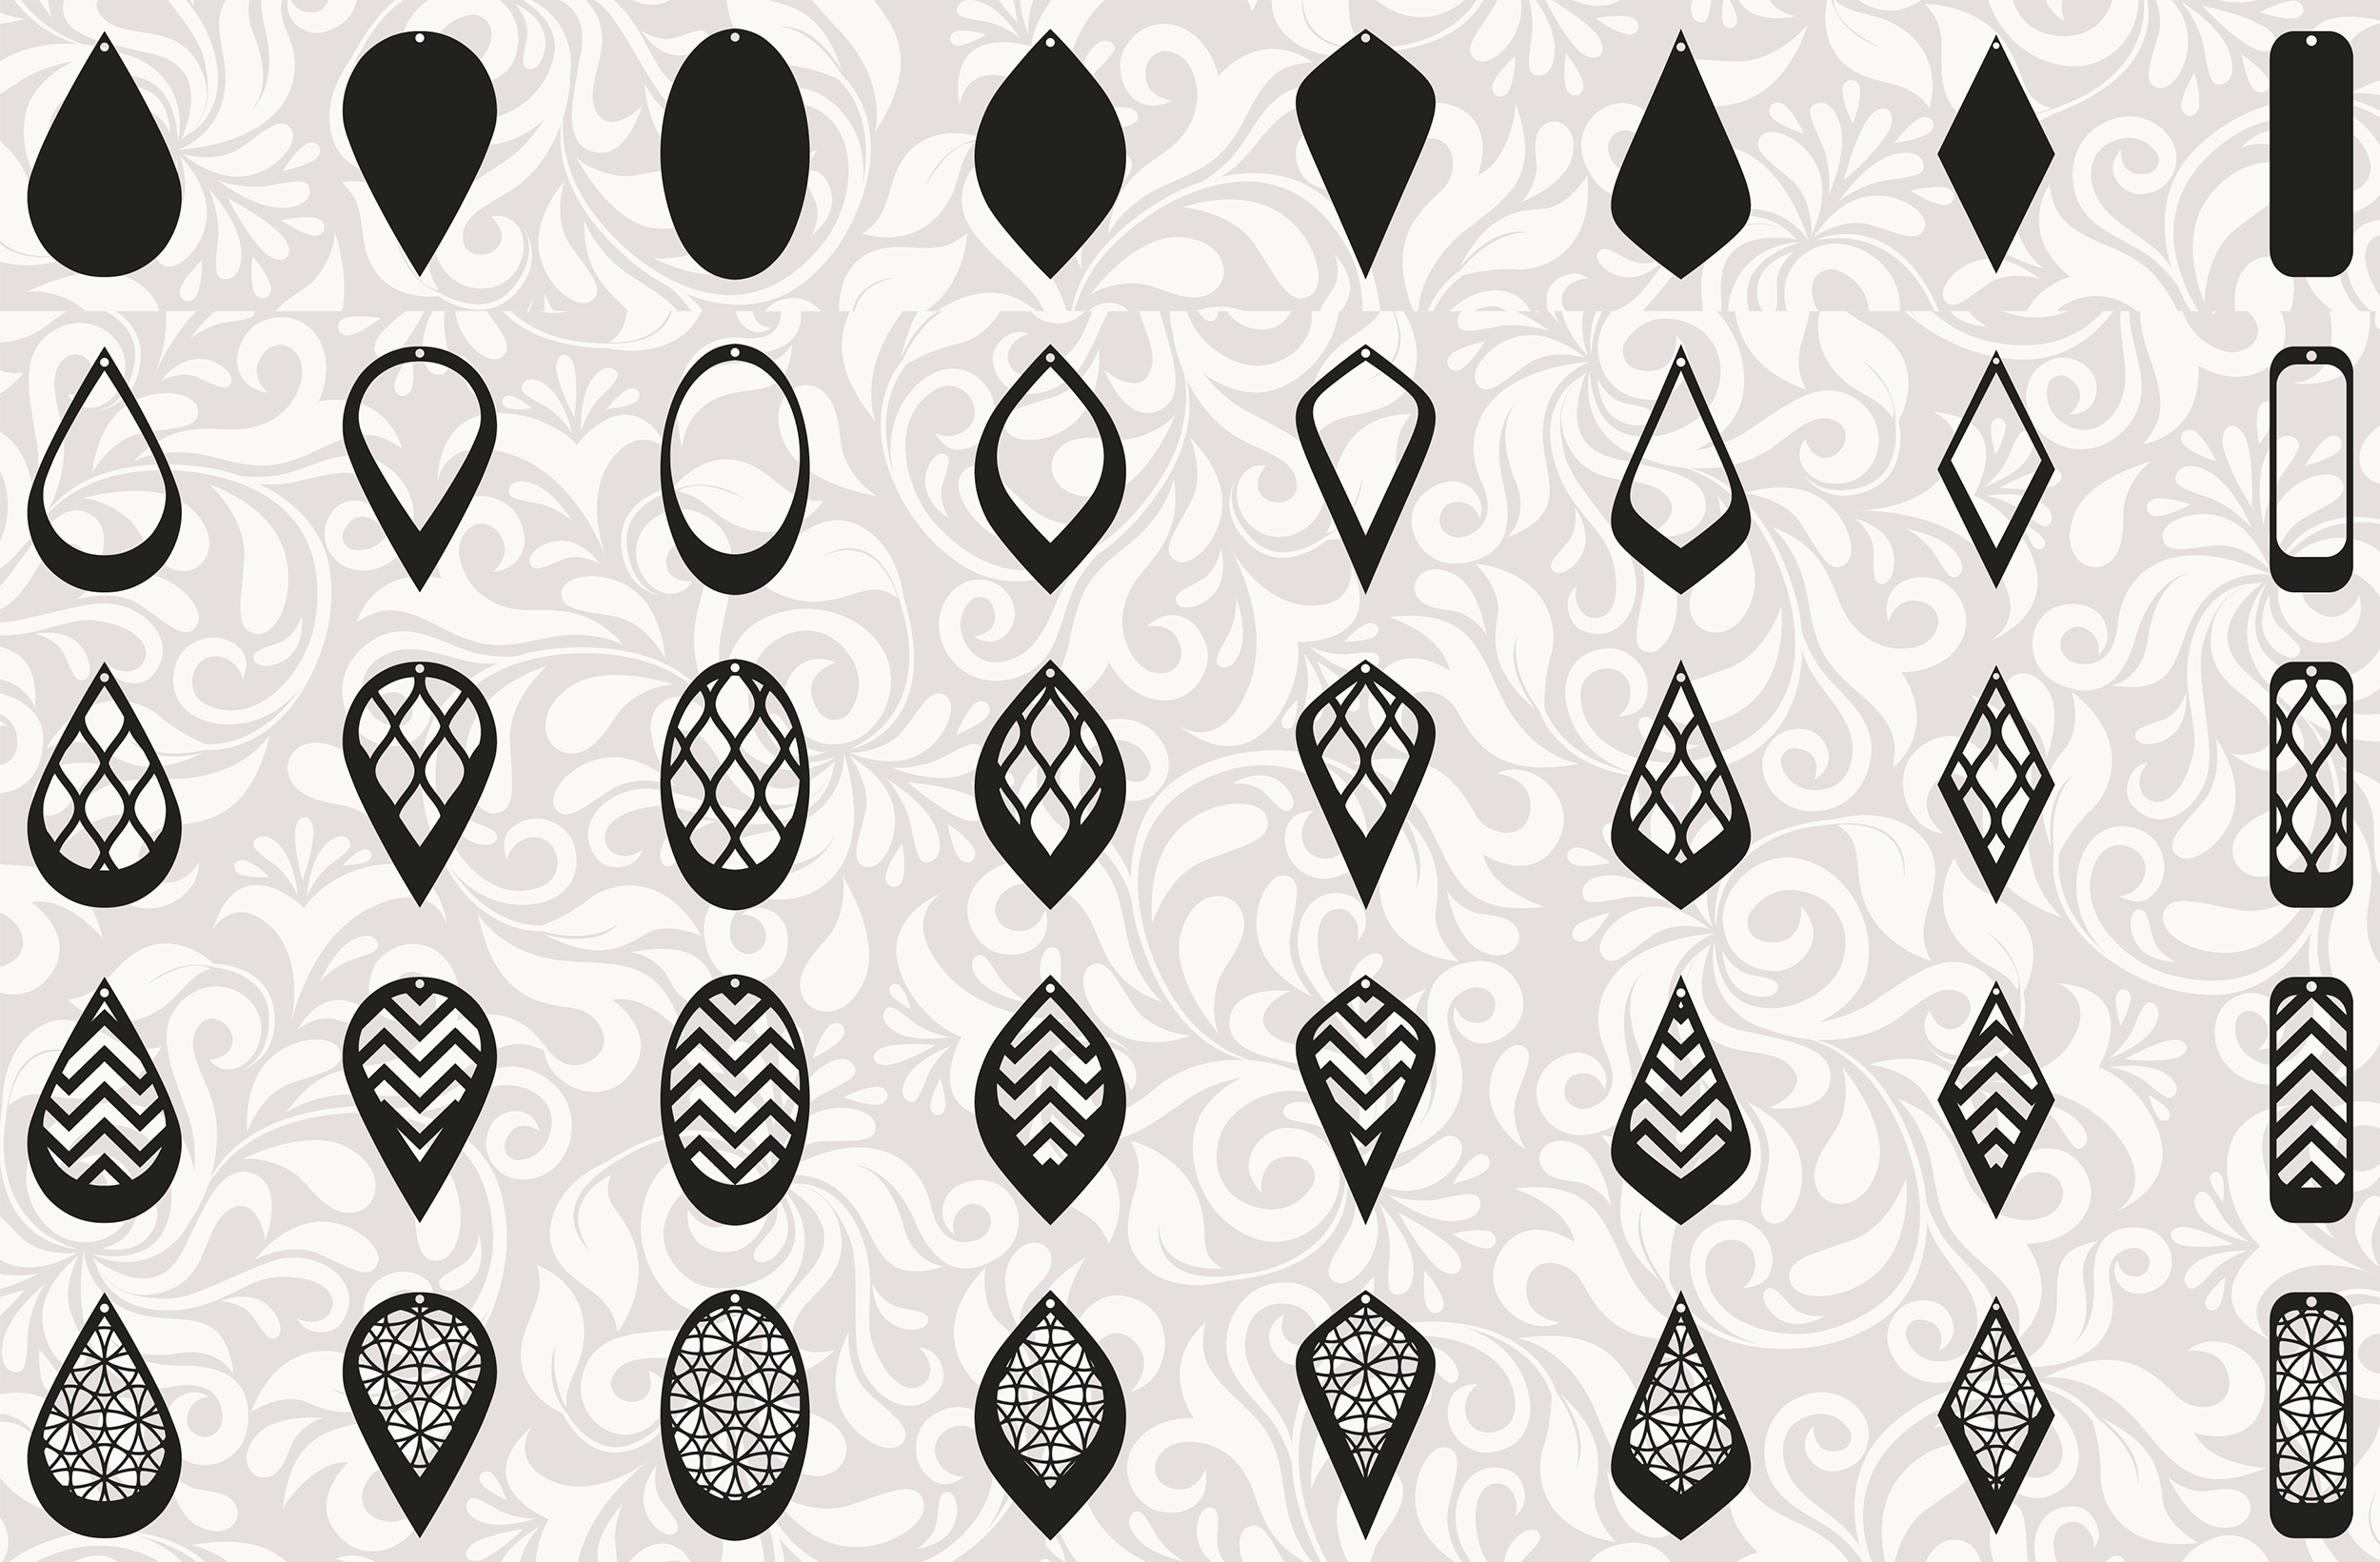 Download 172 Earrings template SVG - Cut files - Leather earrings SVG